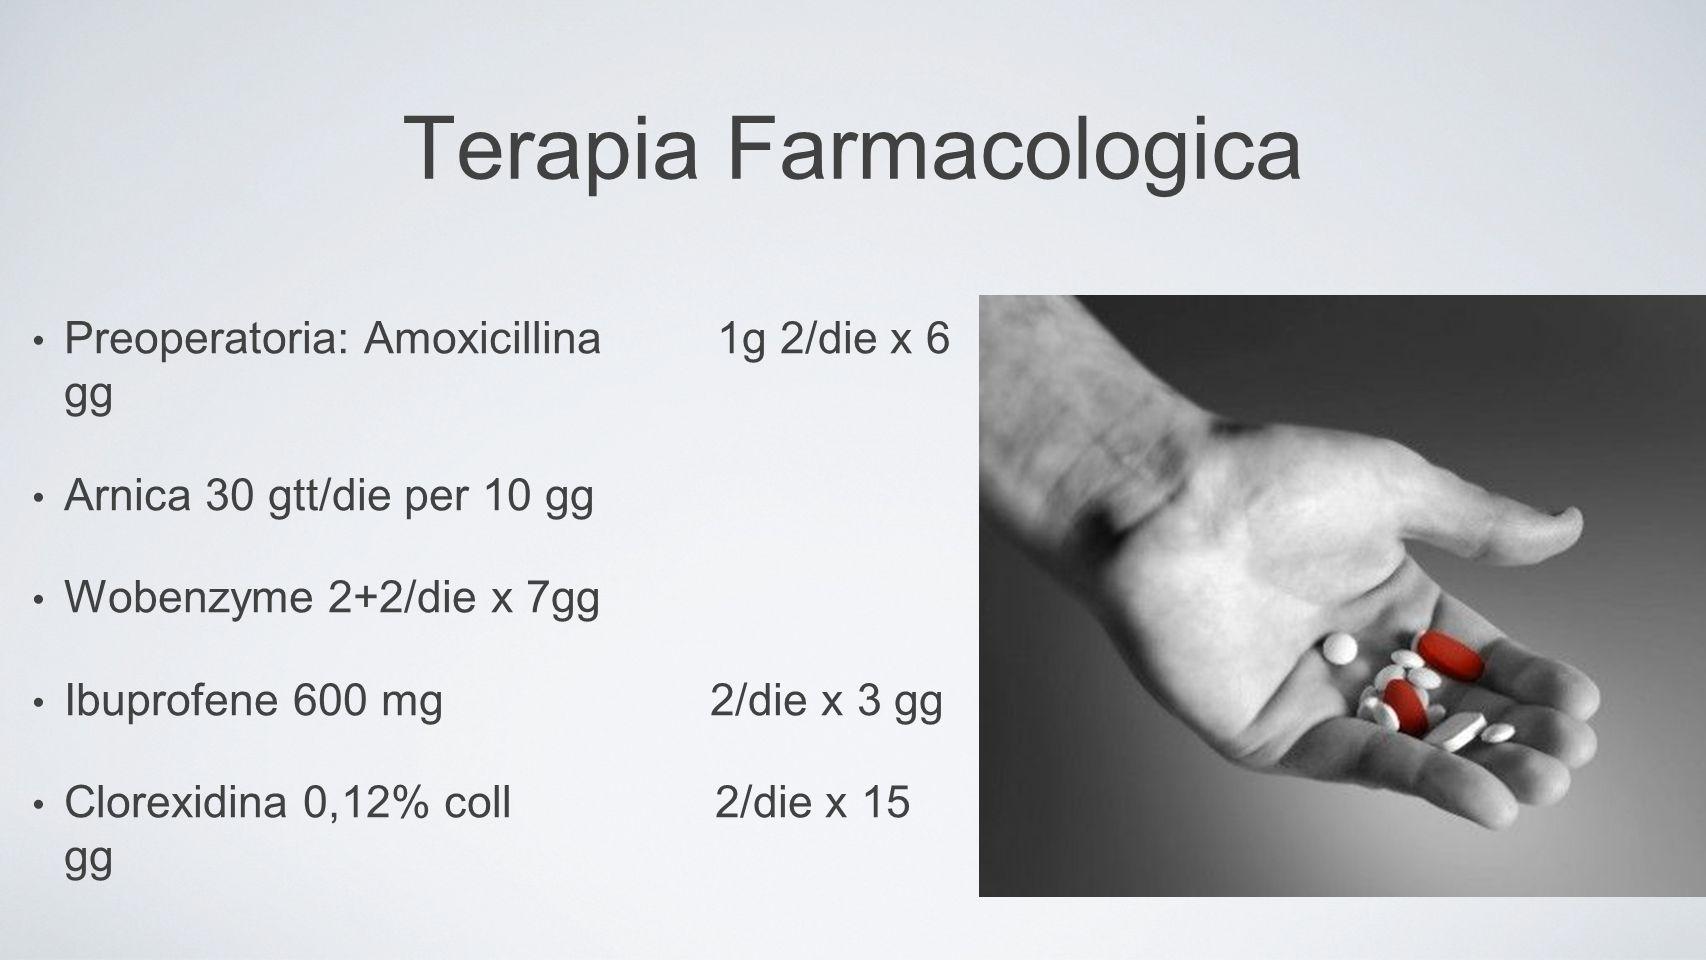 Terapia Farmacologica Preoperatoria: Amoxicillina 1g 2/die x 6 gg Arnica 30 gtt/die per 10 gg Wobenzyme 2+2/die x 7gg Ibuprofene 600 mg 2/die x 3 gg C